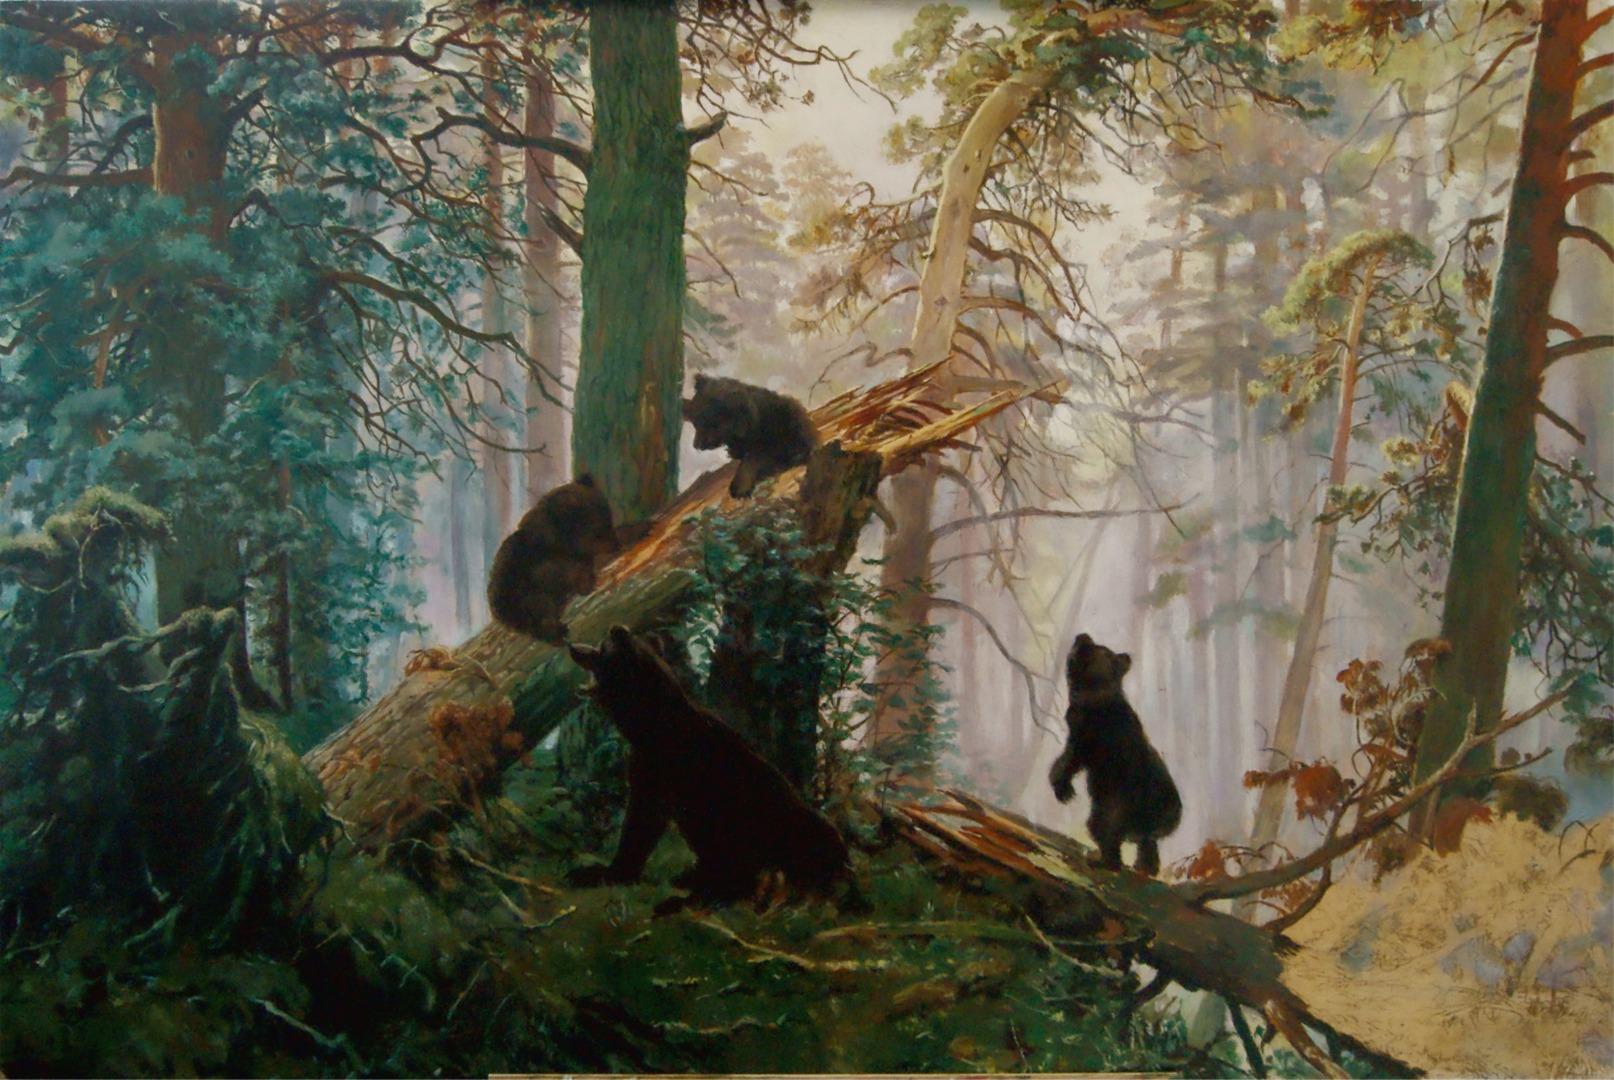 увидеть обои на рабочий стол три медведя шишкин онлайн инструмент